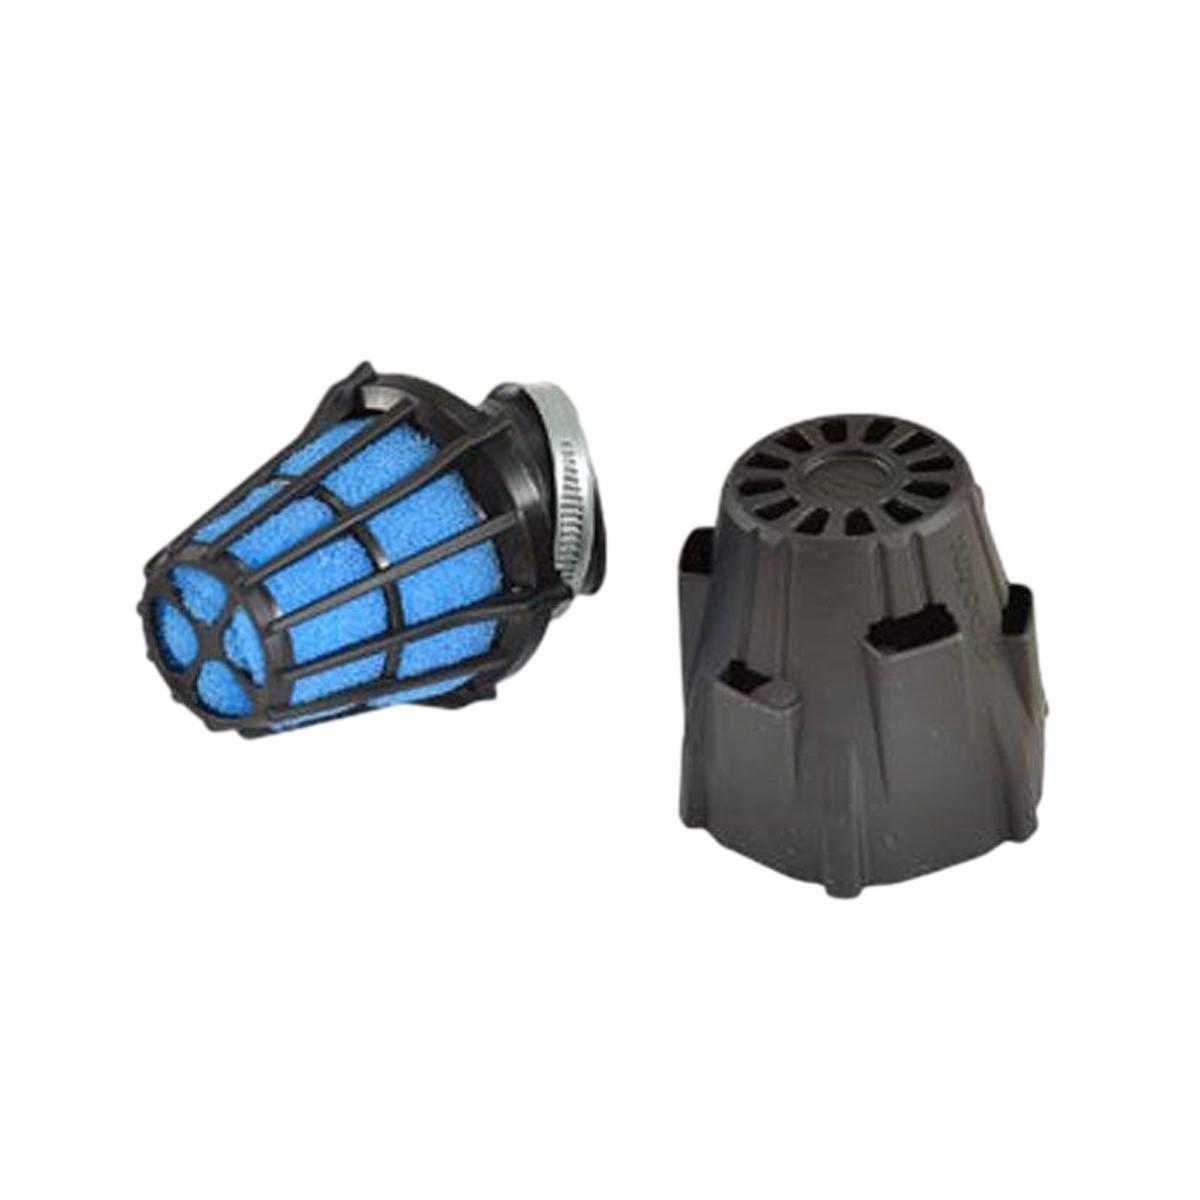 Filtre à Air + Boite Coudé 30° Ø32mm PHBG - POLINI